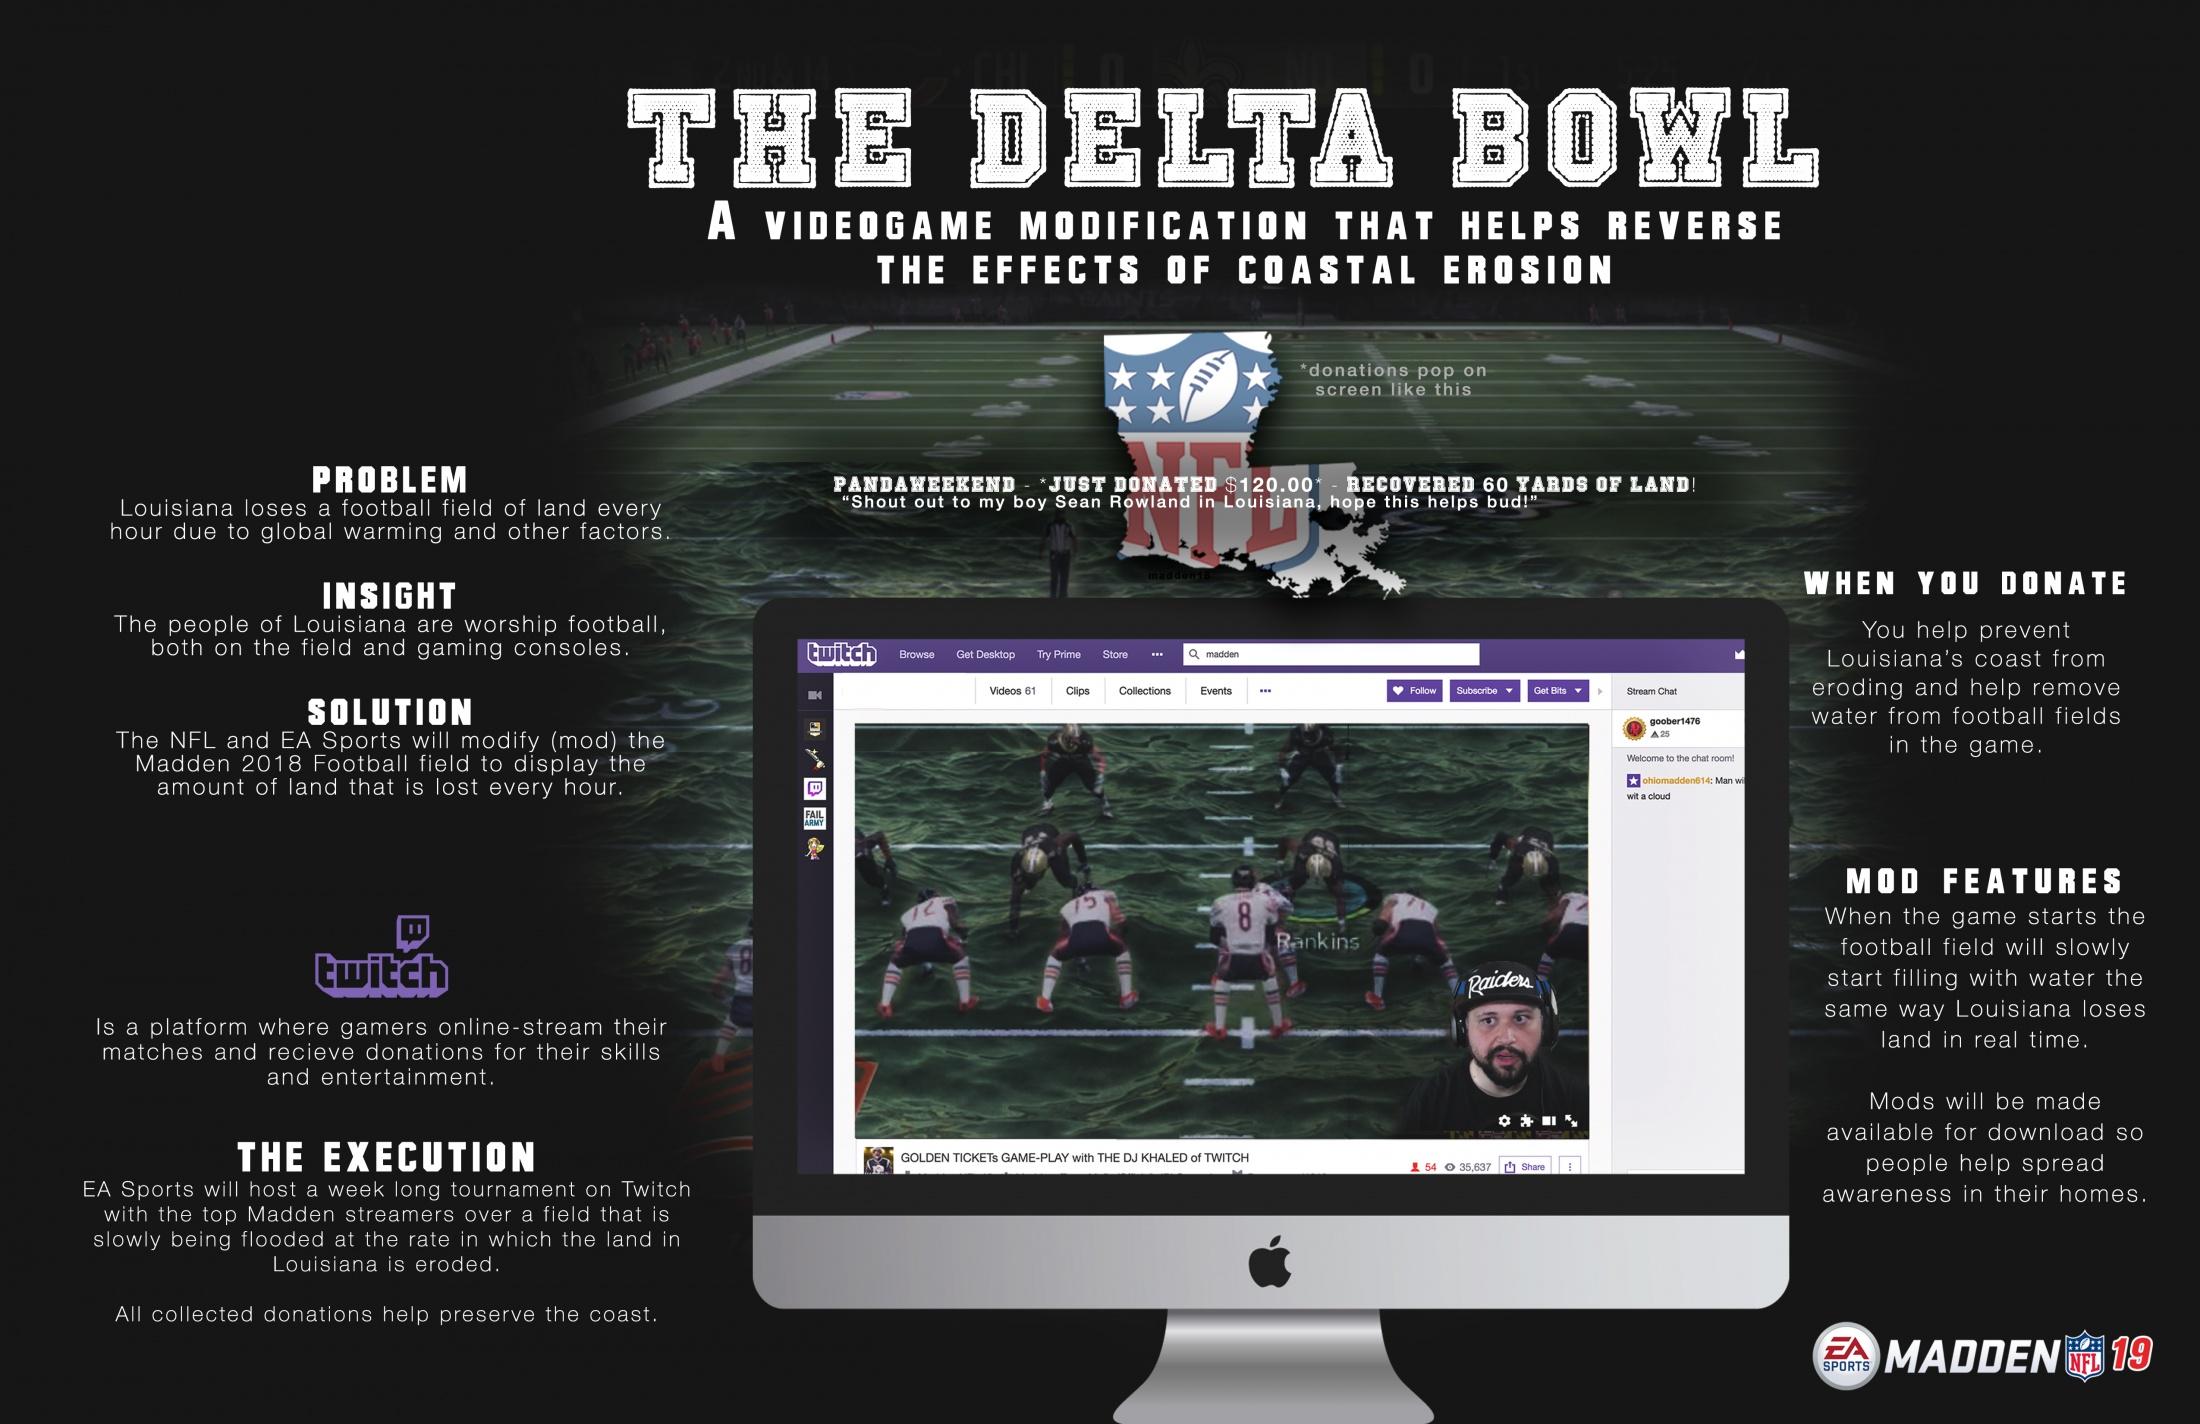 Thumbnail for THE DELTA BOWL